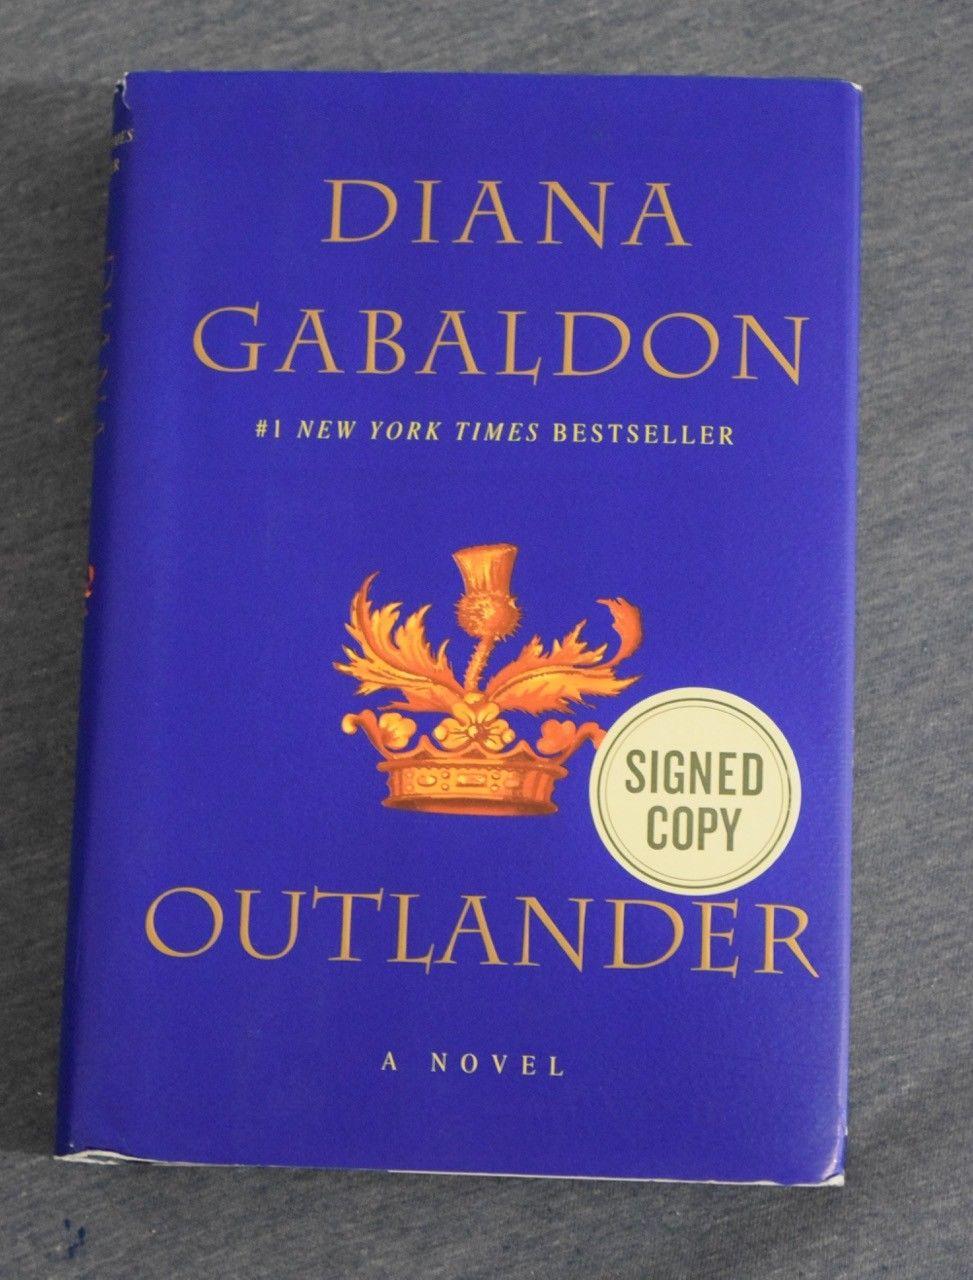 Happy Birthday, Diana Gabaldon!